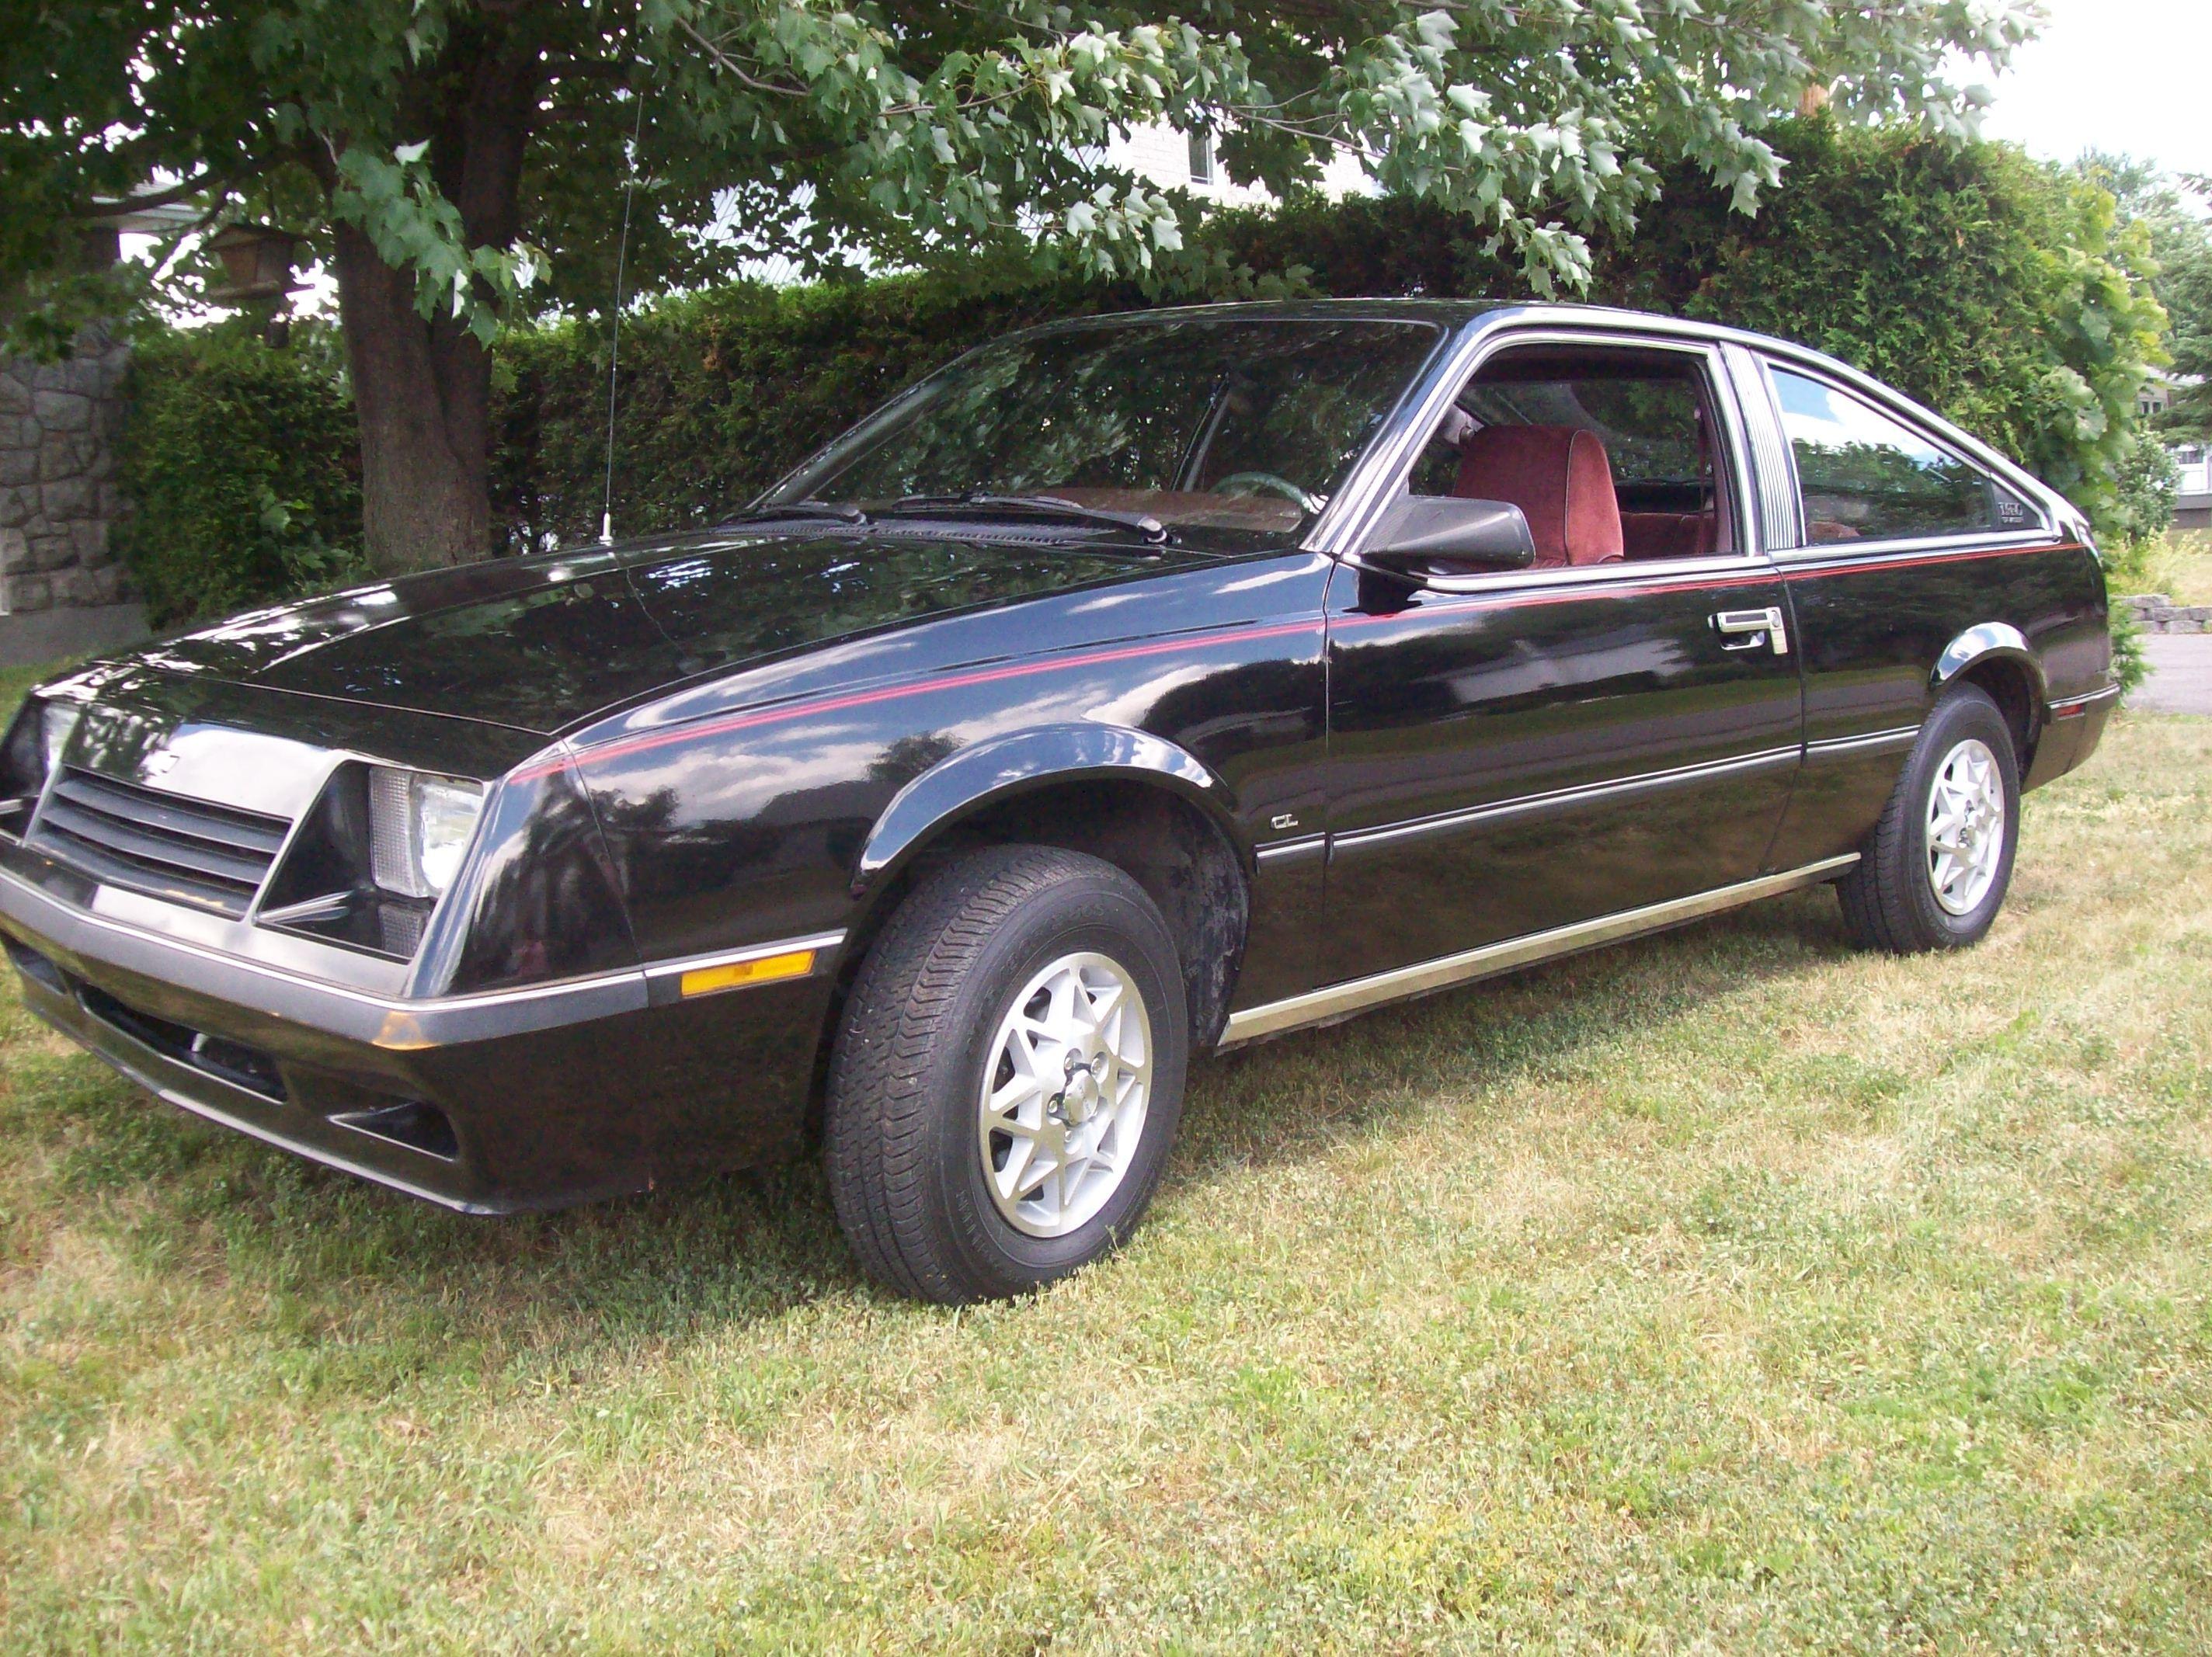 1982 Cavalier Hatchback dashboard   Cohort Sighting: Chevrolet ...